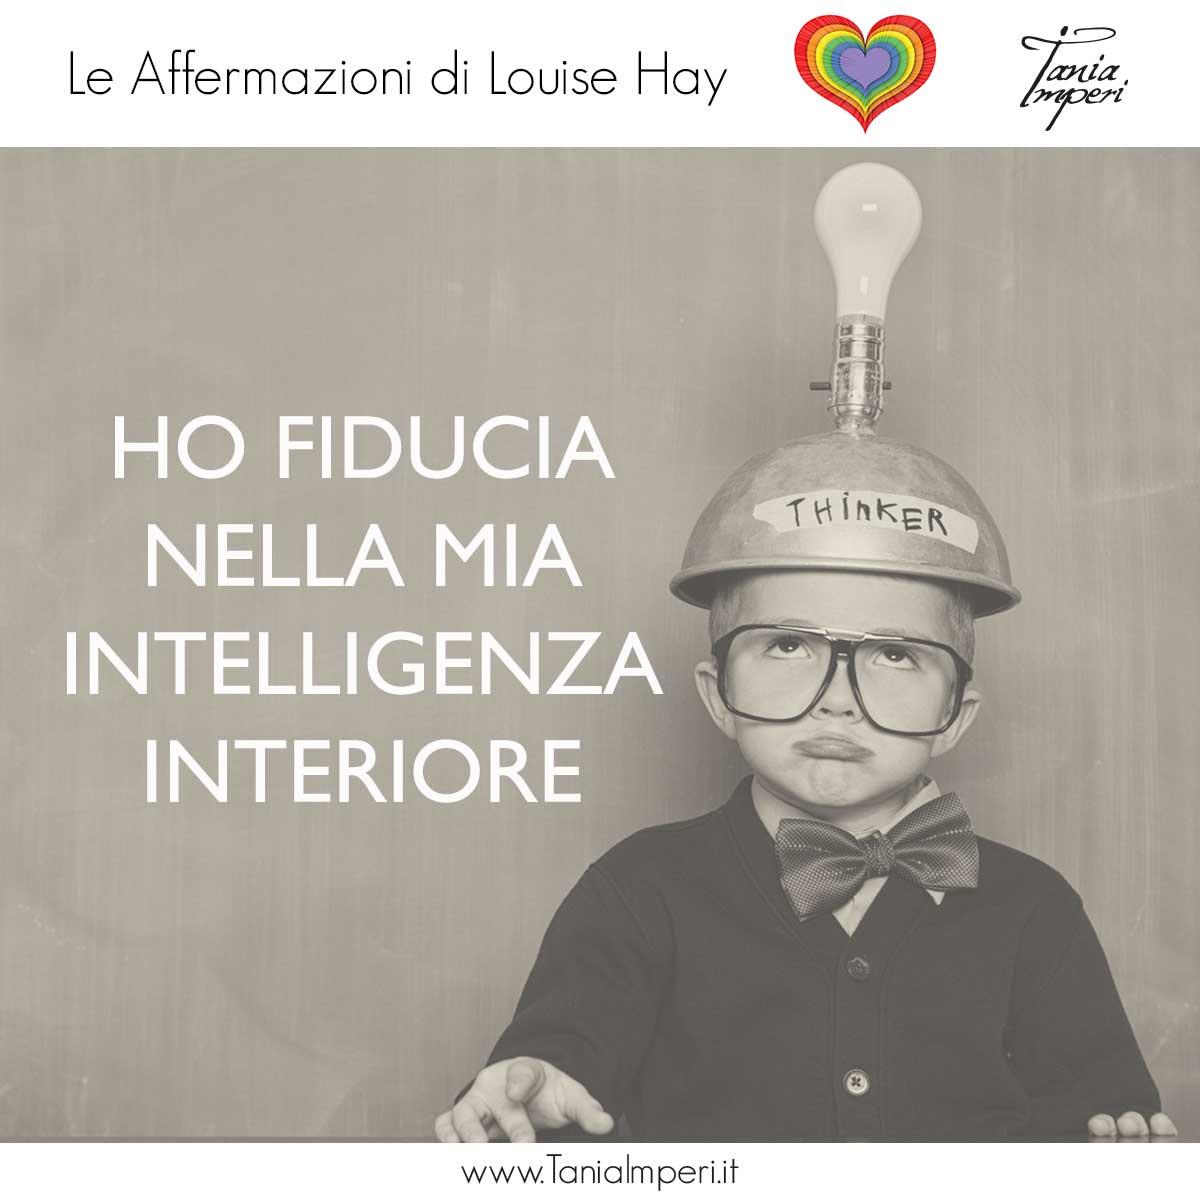 AFFERMAZIONI_LOUISE_HAY_TANIA_IMPERI_03_Intelligenza_interiore_16GEN2017